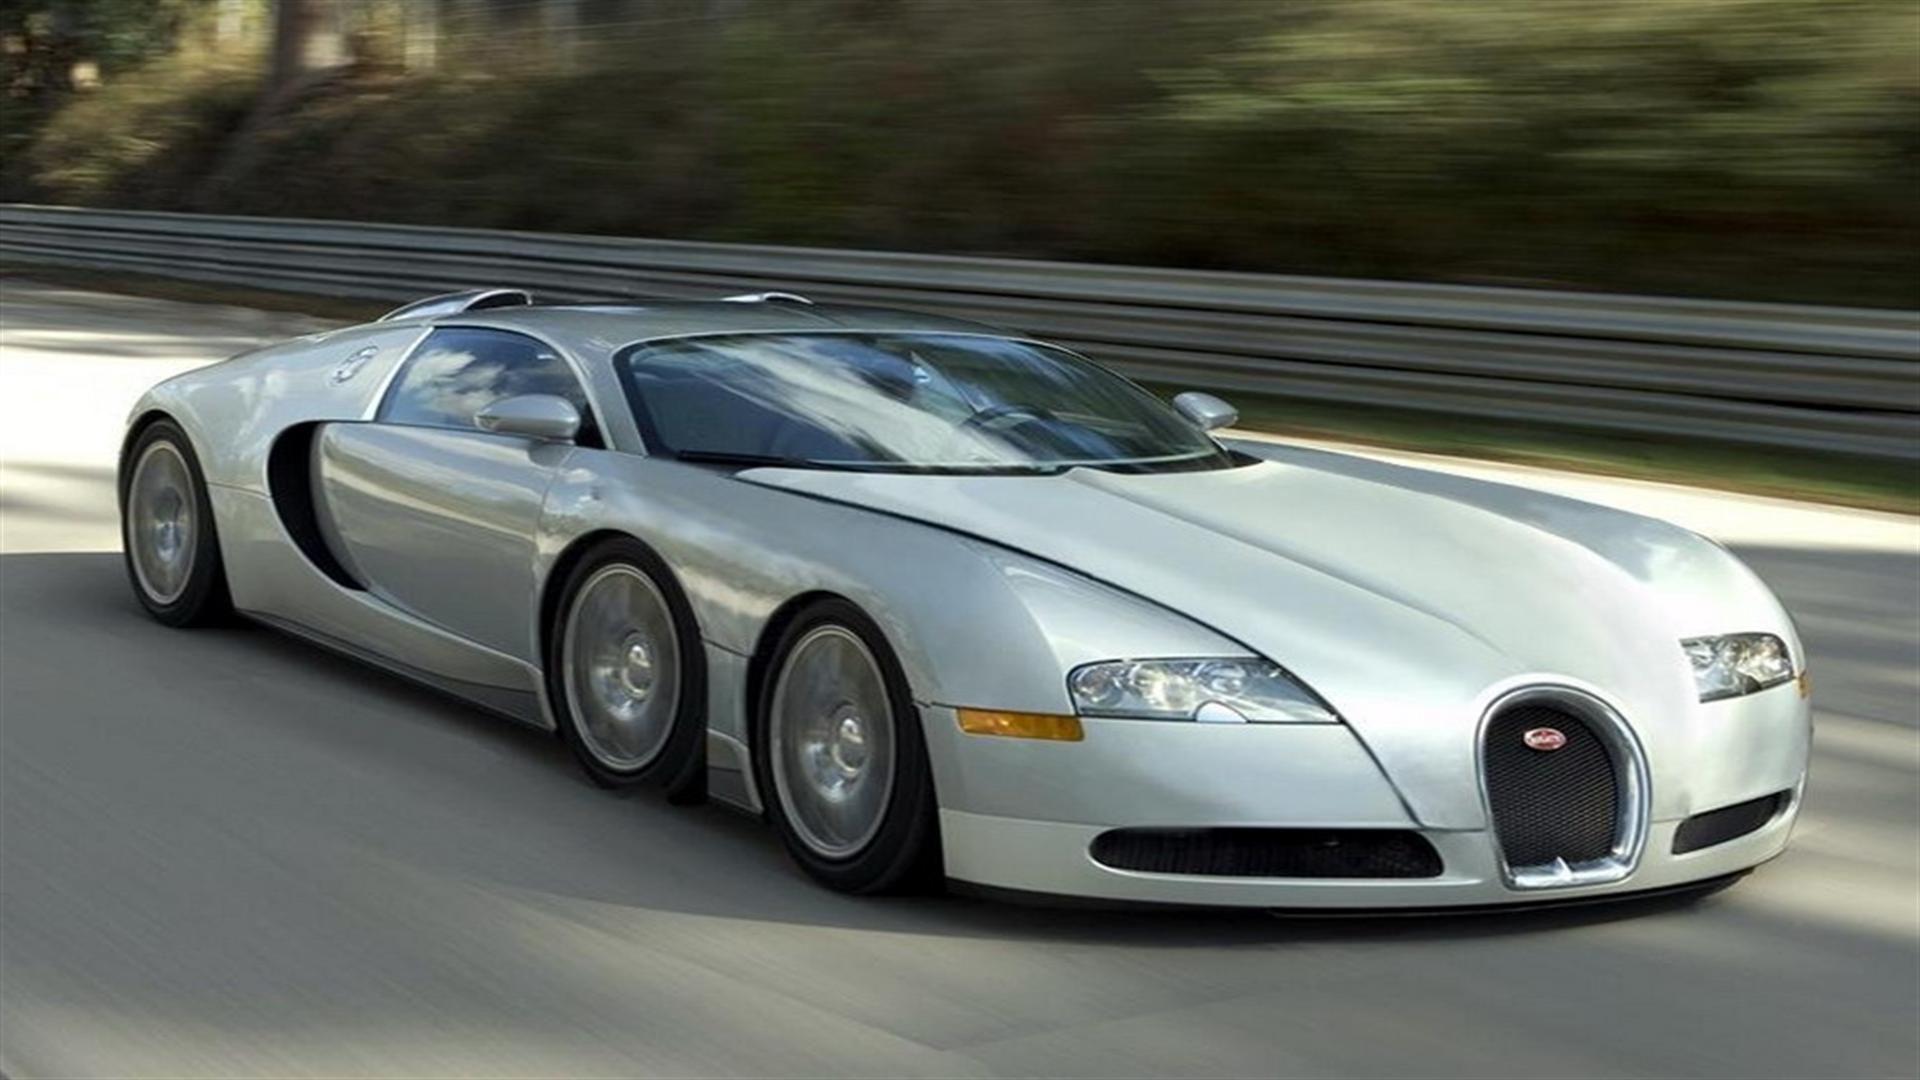 Bugattiwallpaperhdformobile  Bugatti Hd Wallpapers